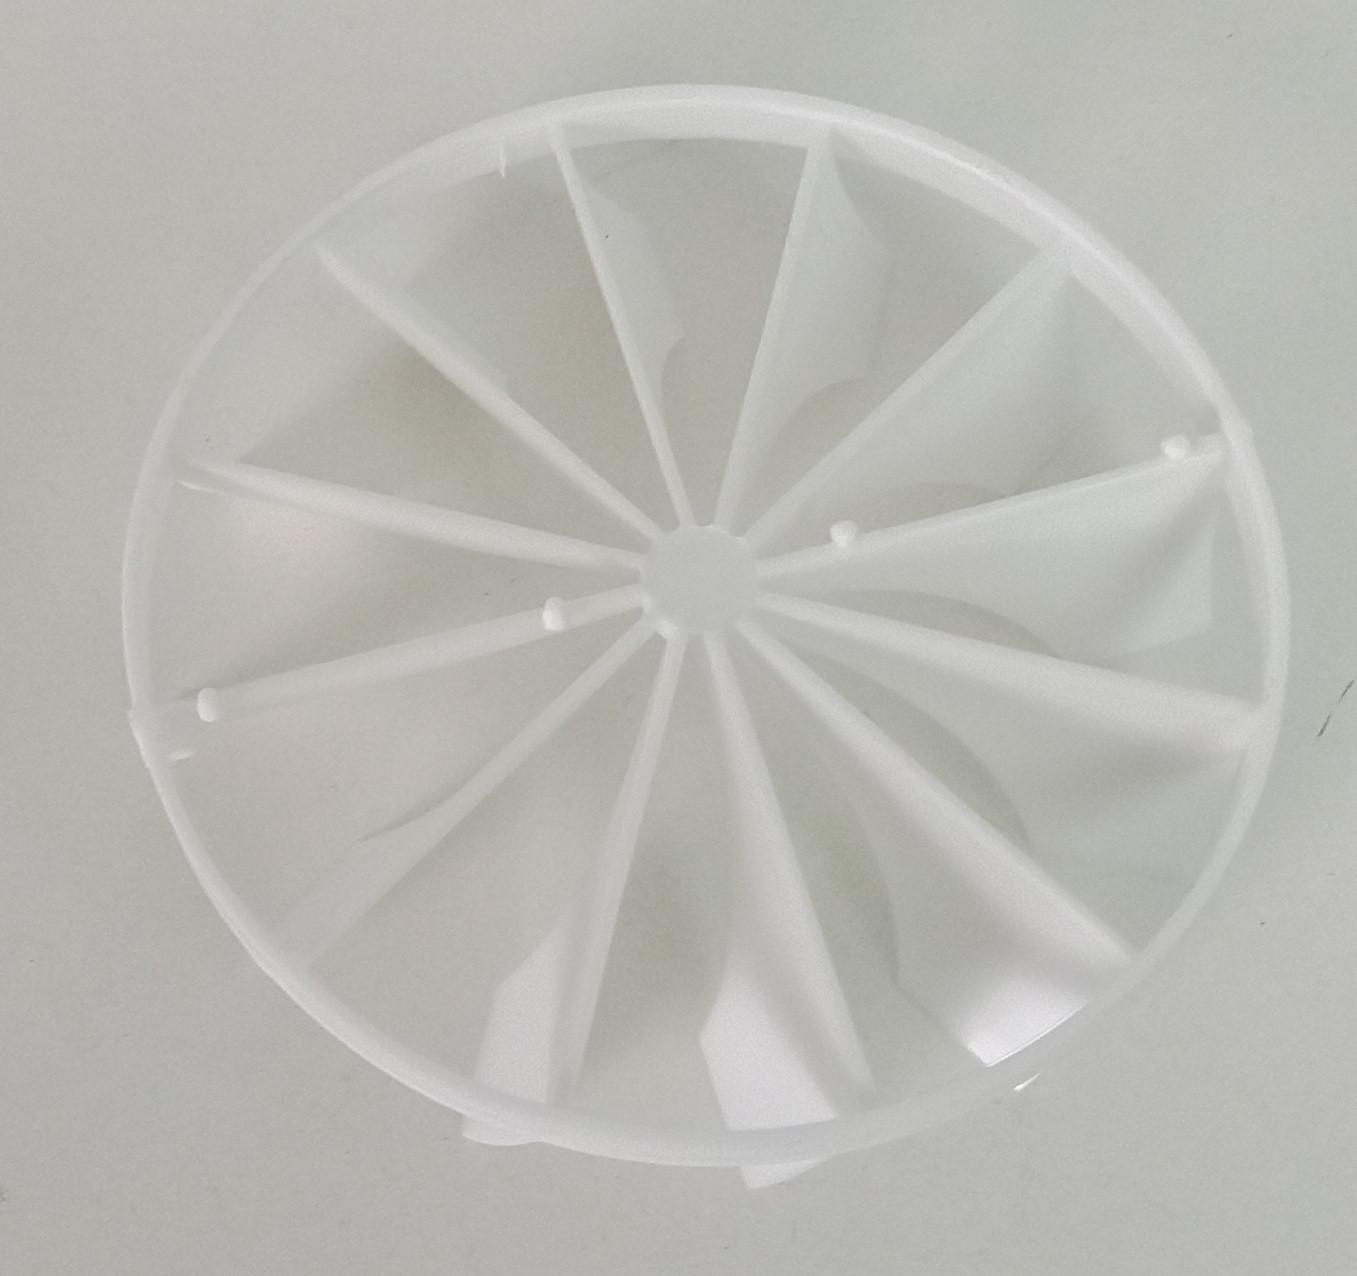 Rückschlagklappe für Bad Ventilator